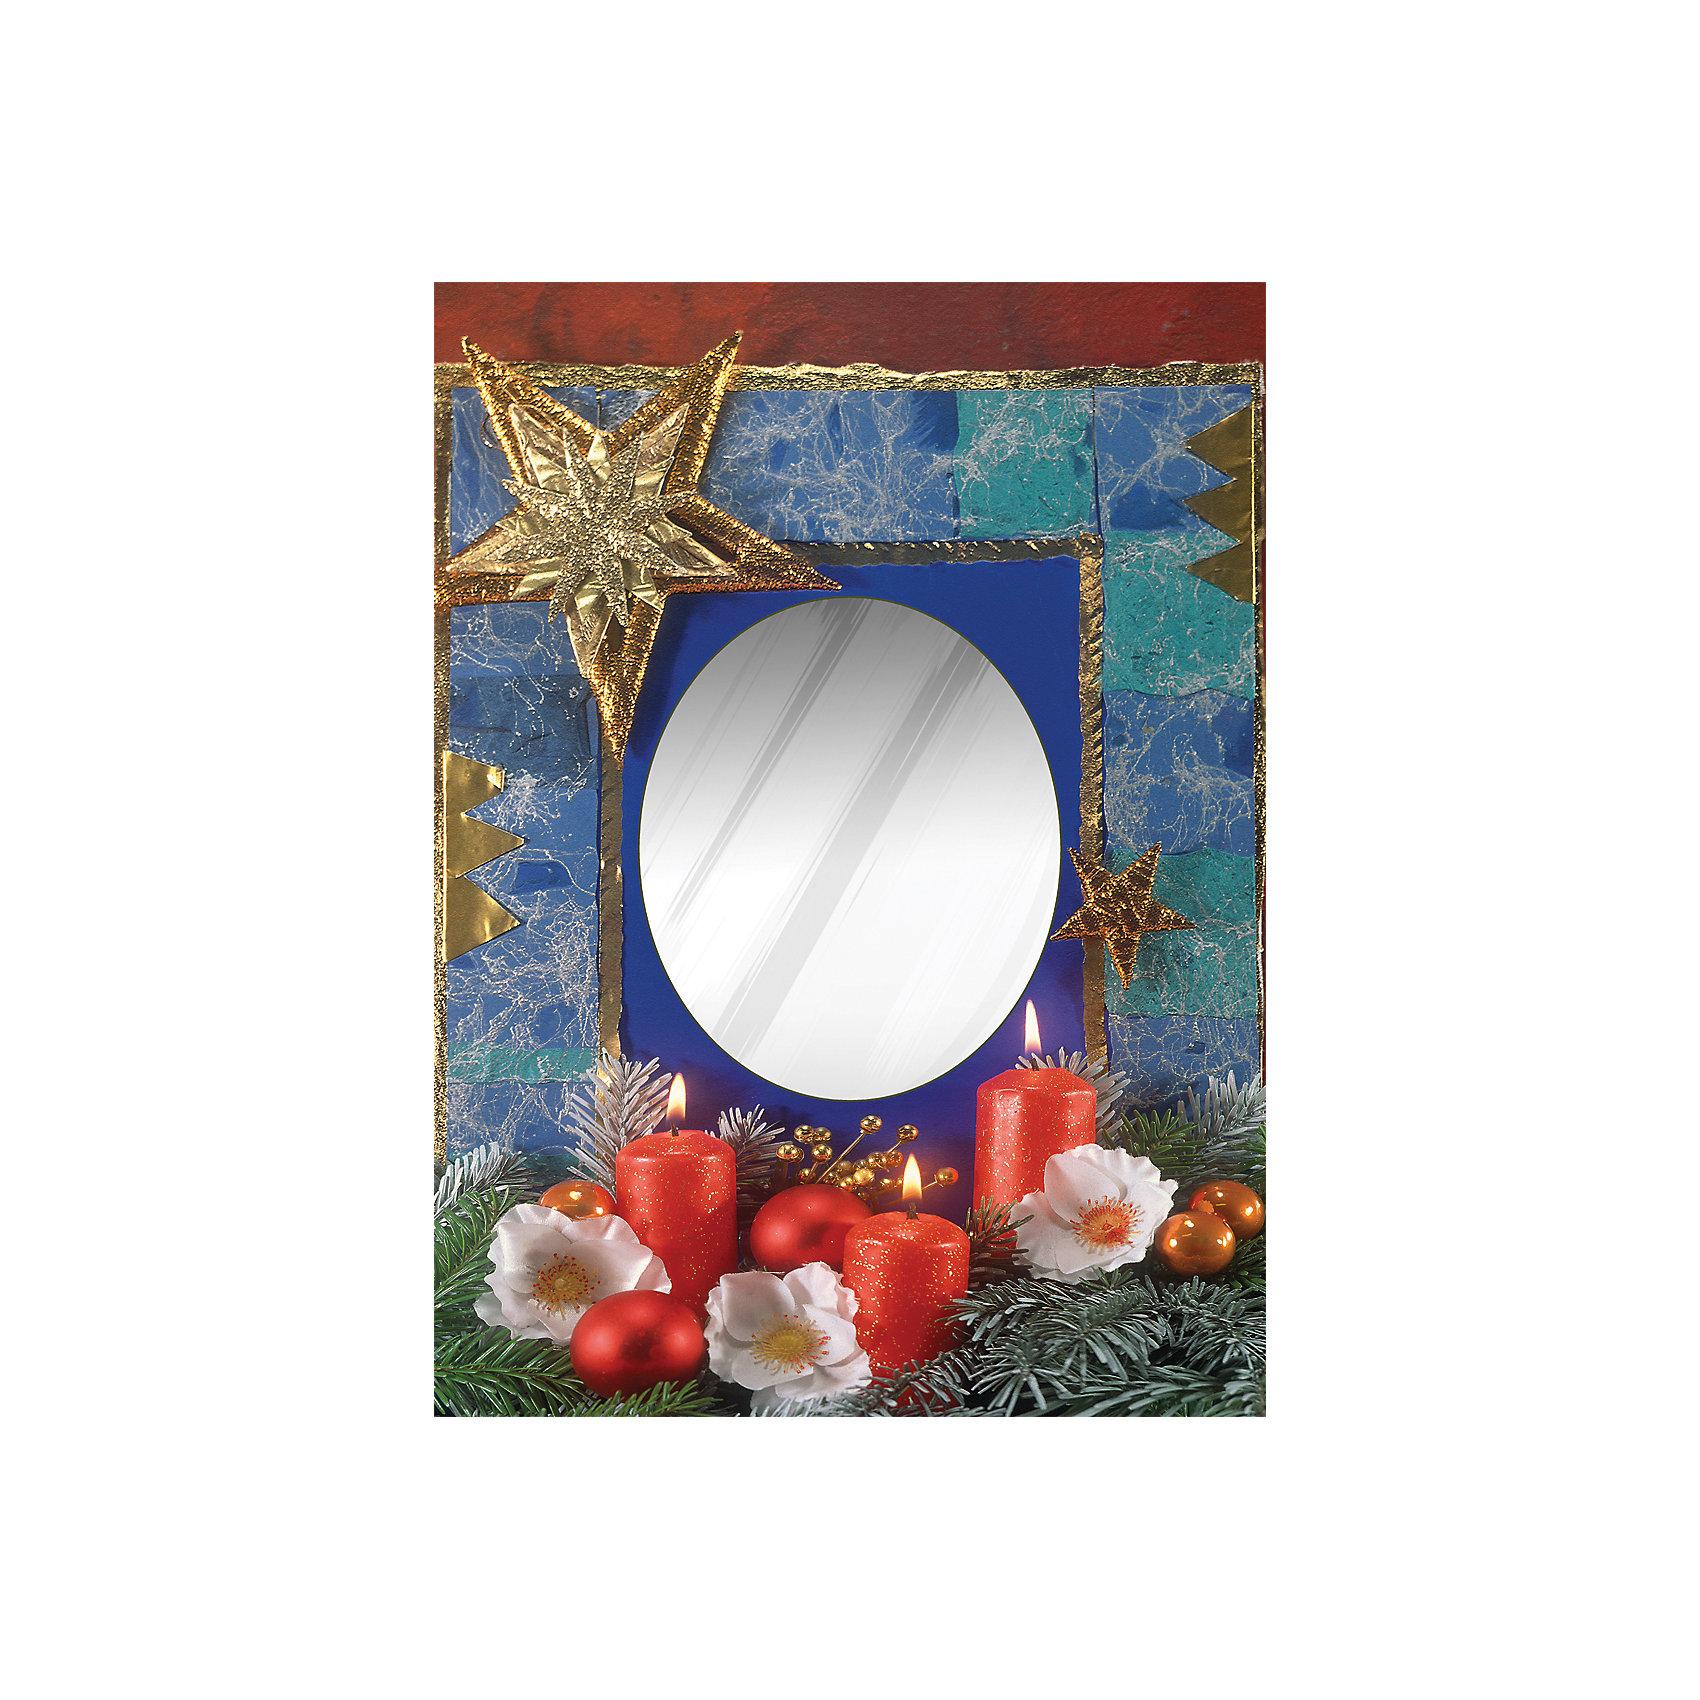 "HEIDI Пазл-зеркало ""С Новым Годом"", 850 деталей, HEIDI"